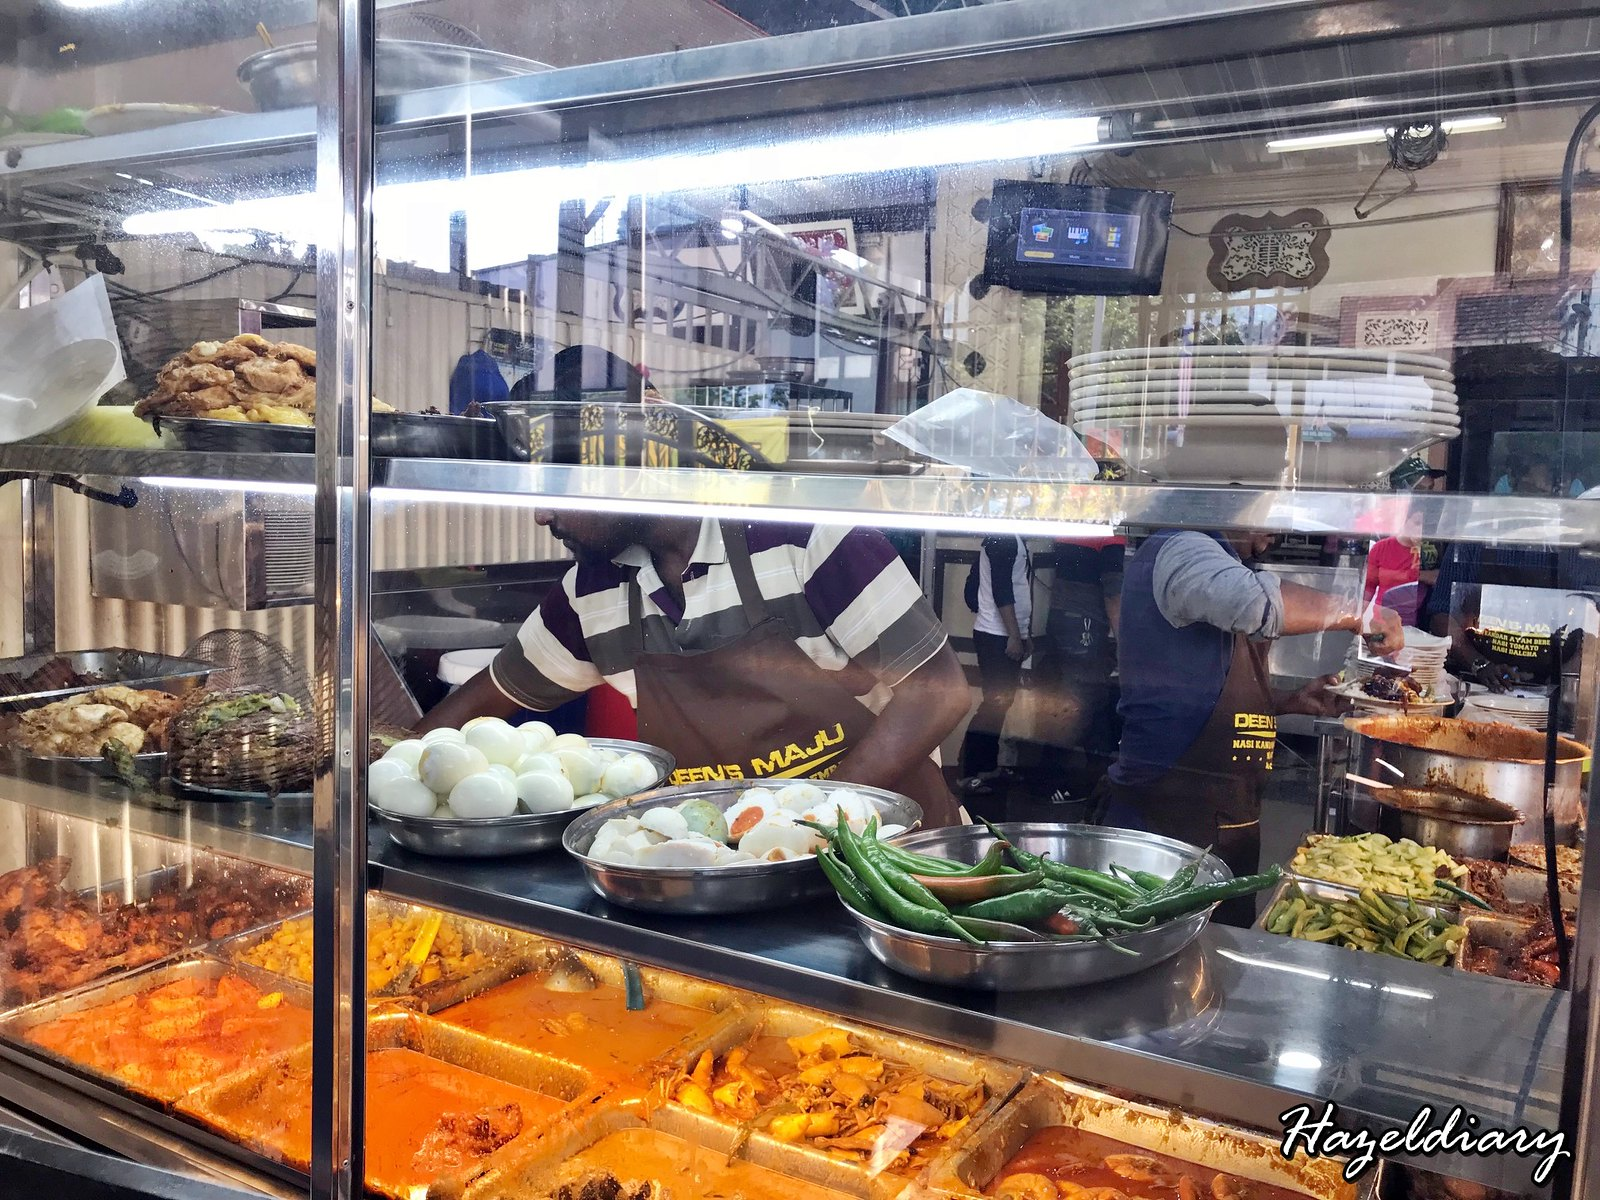 PENANG EATS] Deen Maju George Town – One of Local's